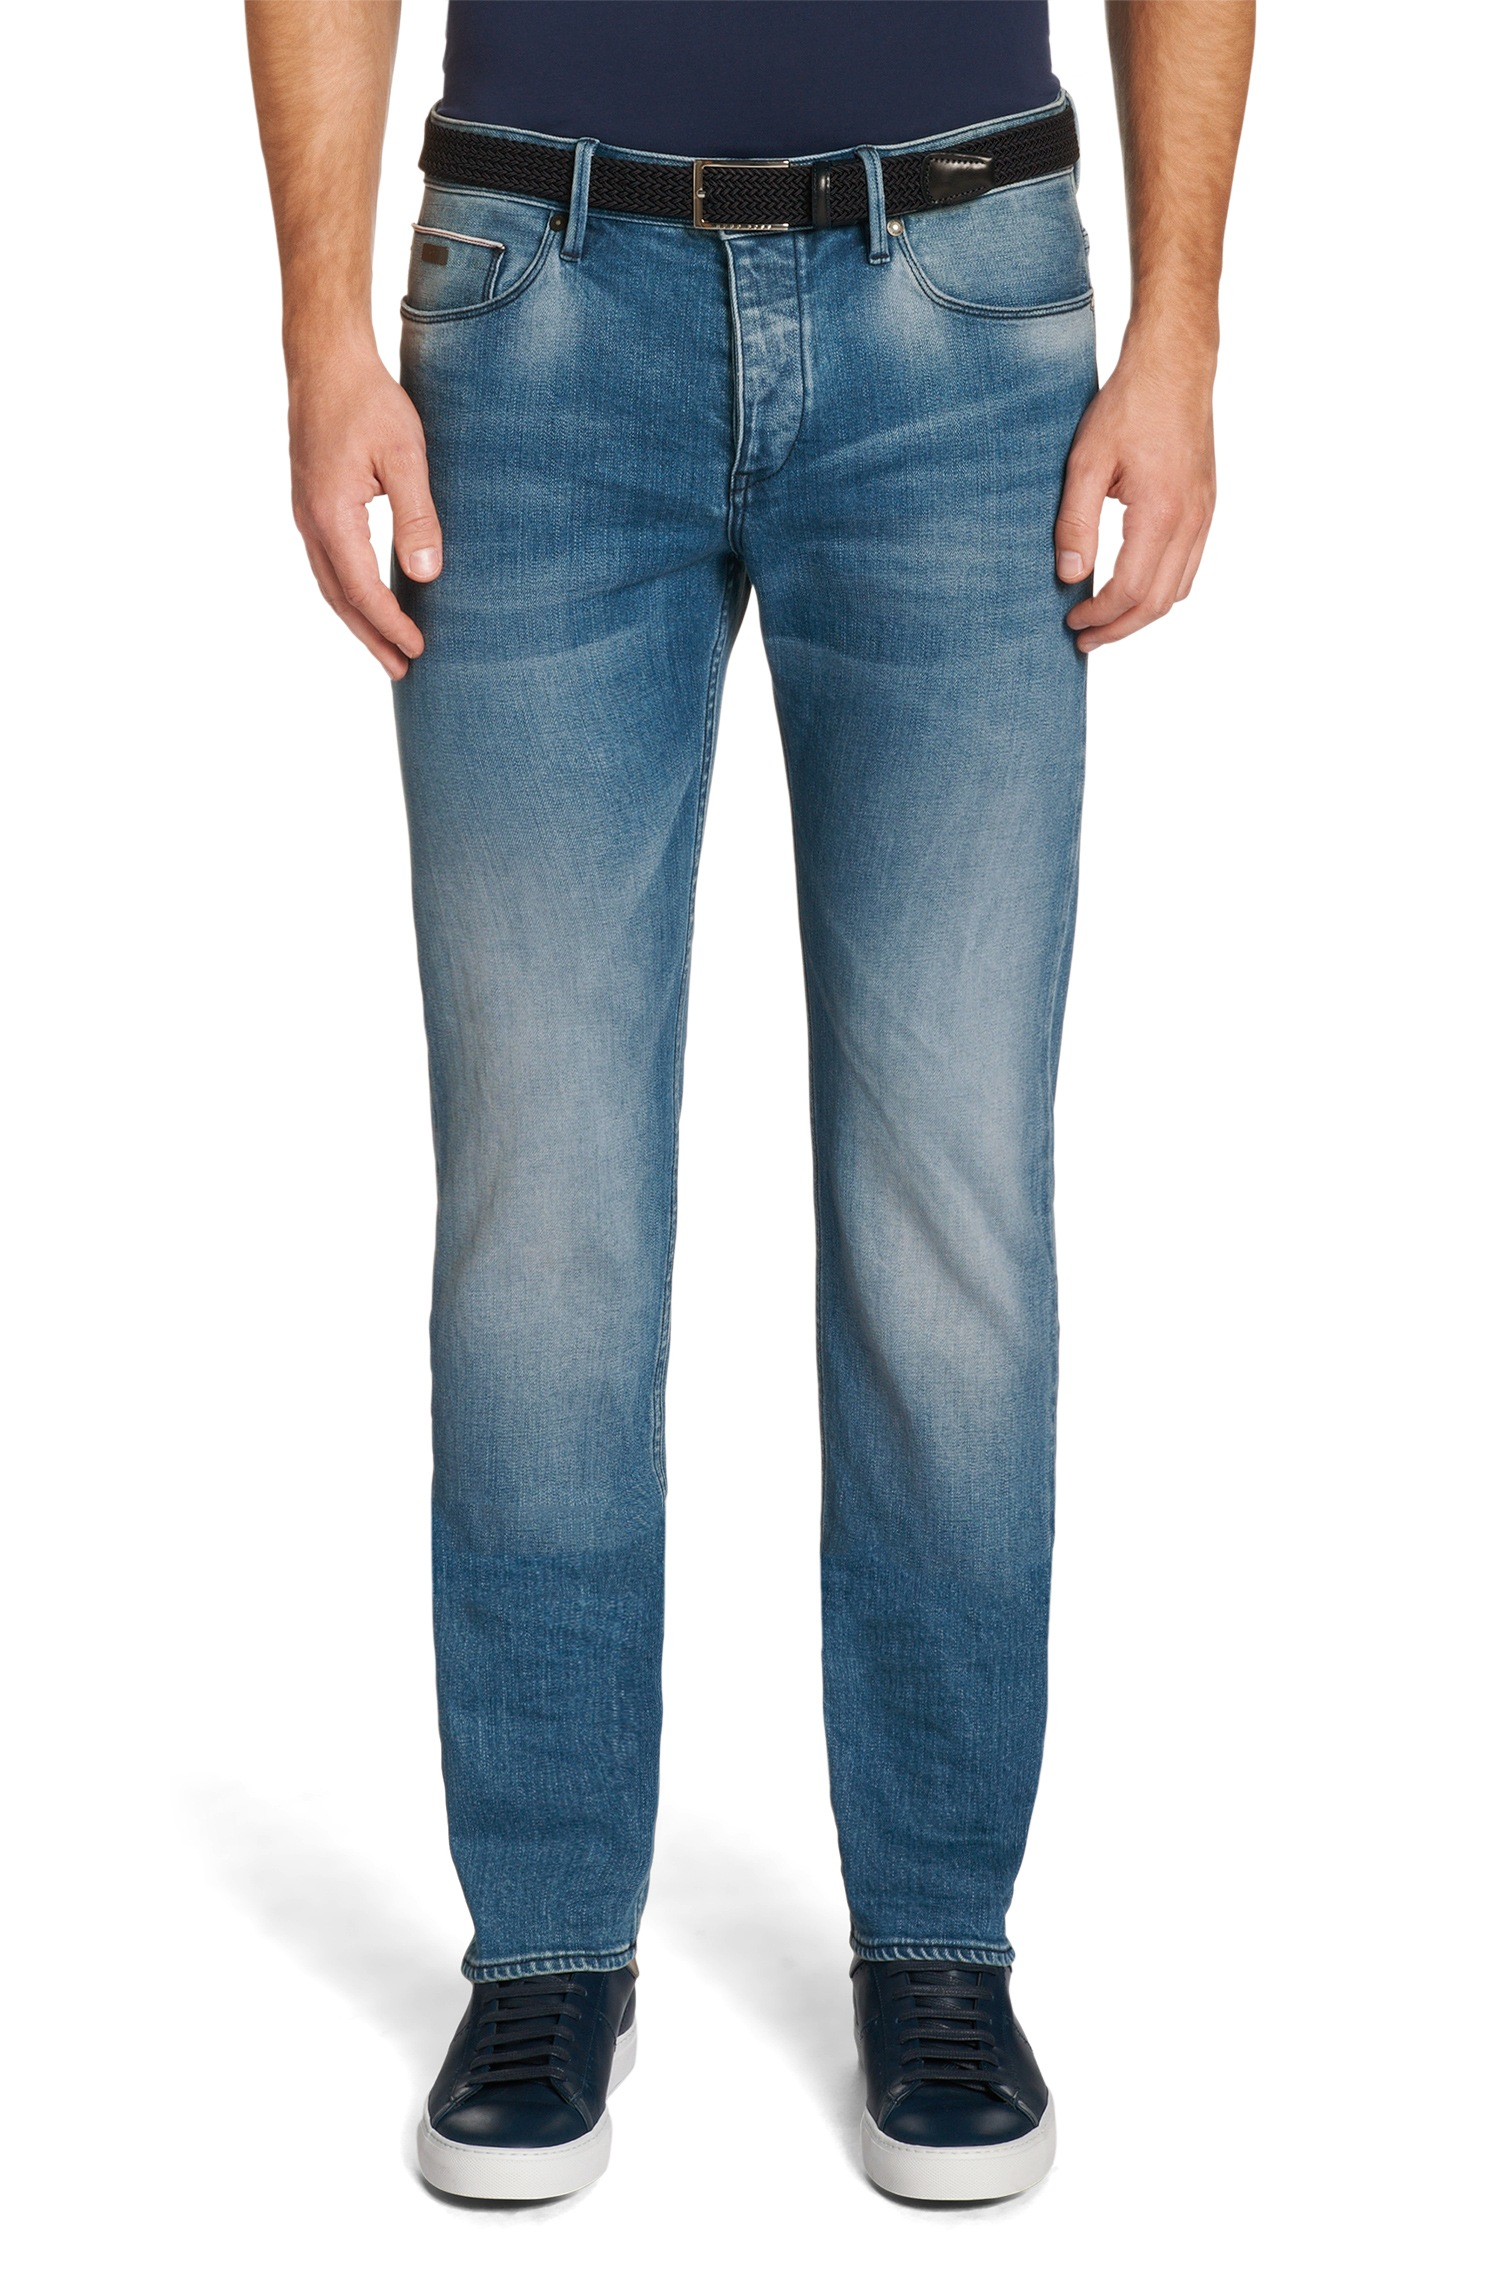 boss slim fit jeans in stretch cotton 39 delaware3 edge 39 in. Black Bedroom Furniture Sets. Home Design Ideas